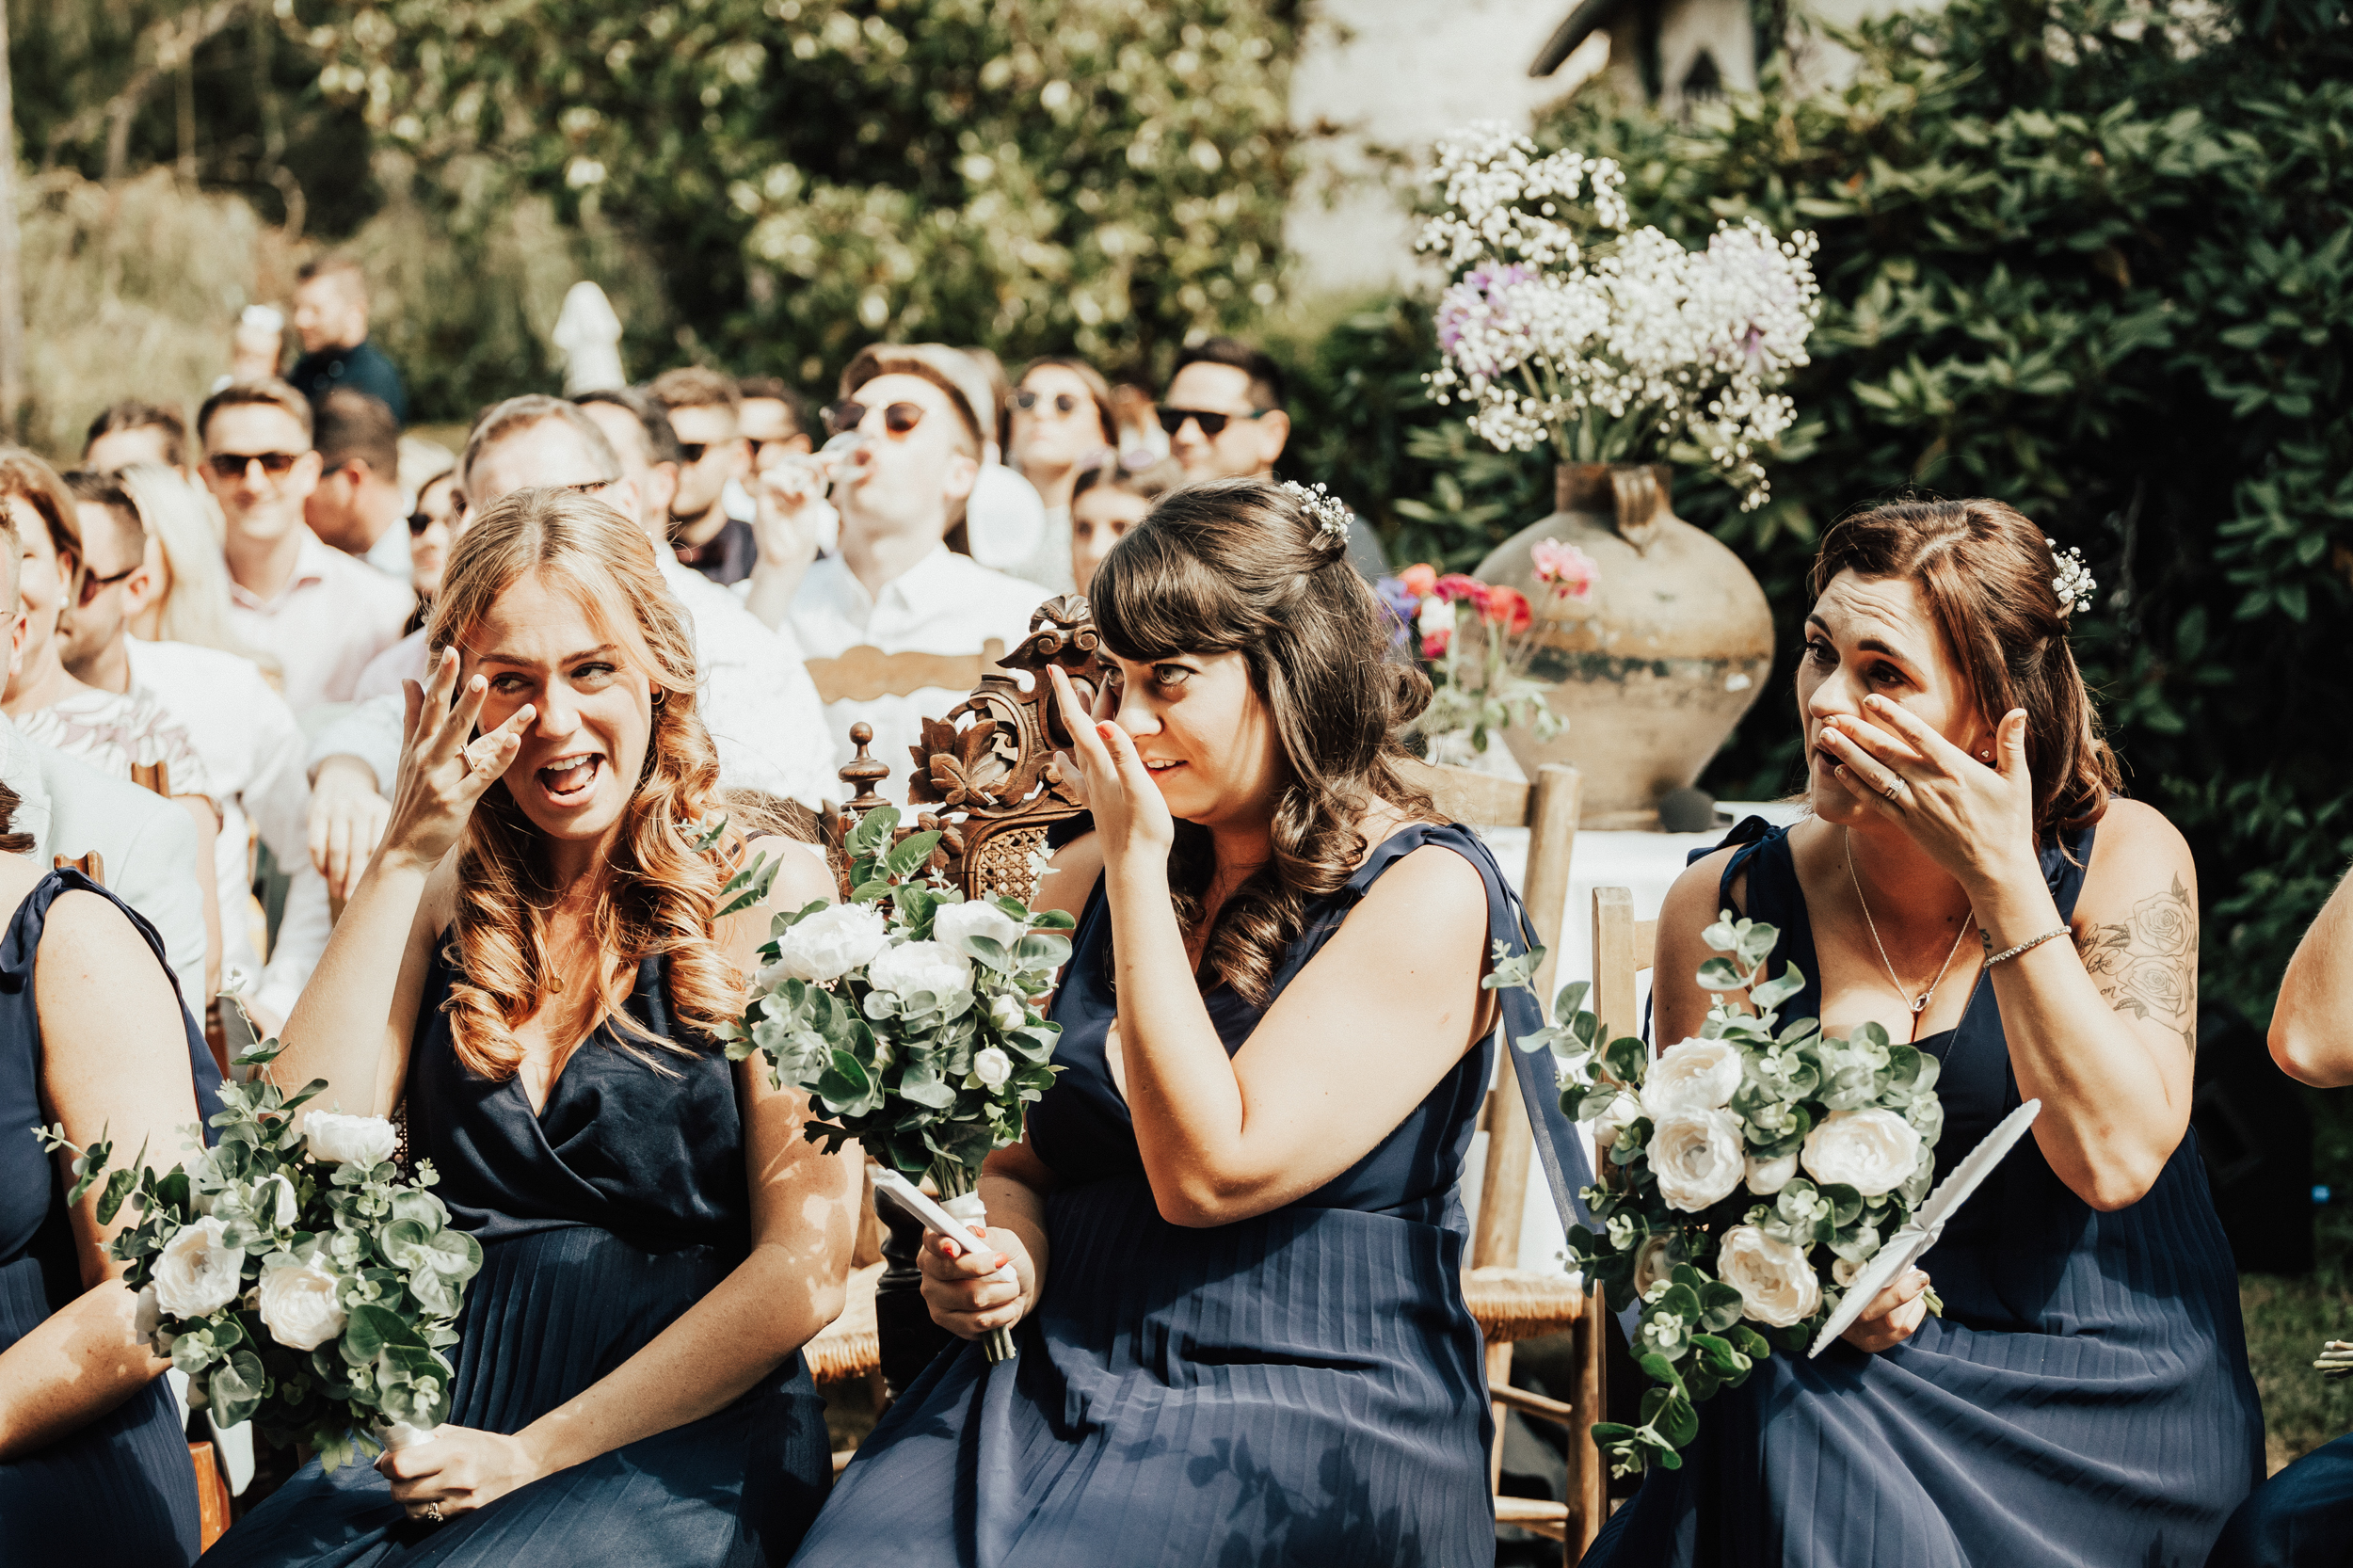 Amy-Zac-Destination-Wedding-France-Manoir-Foulquetiere-Darina-Stoda-Photography-46.jpg